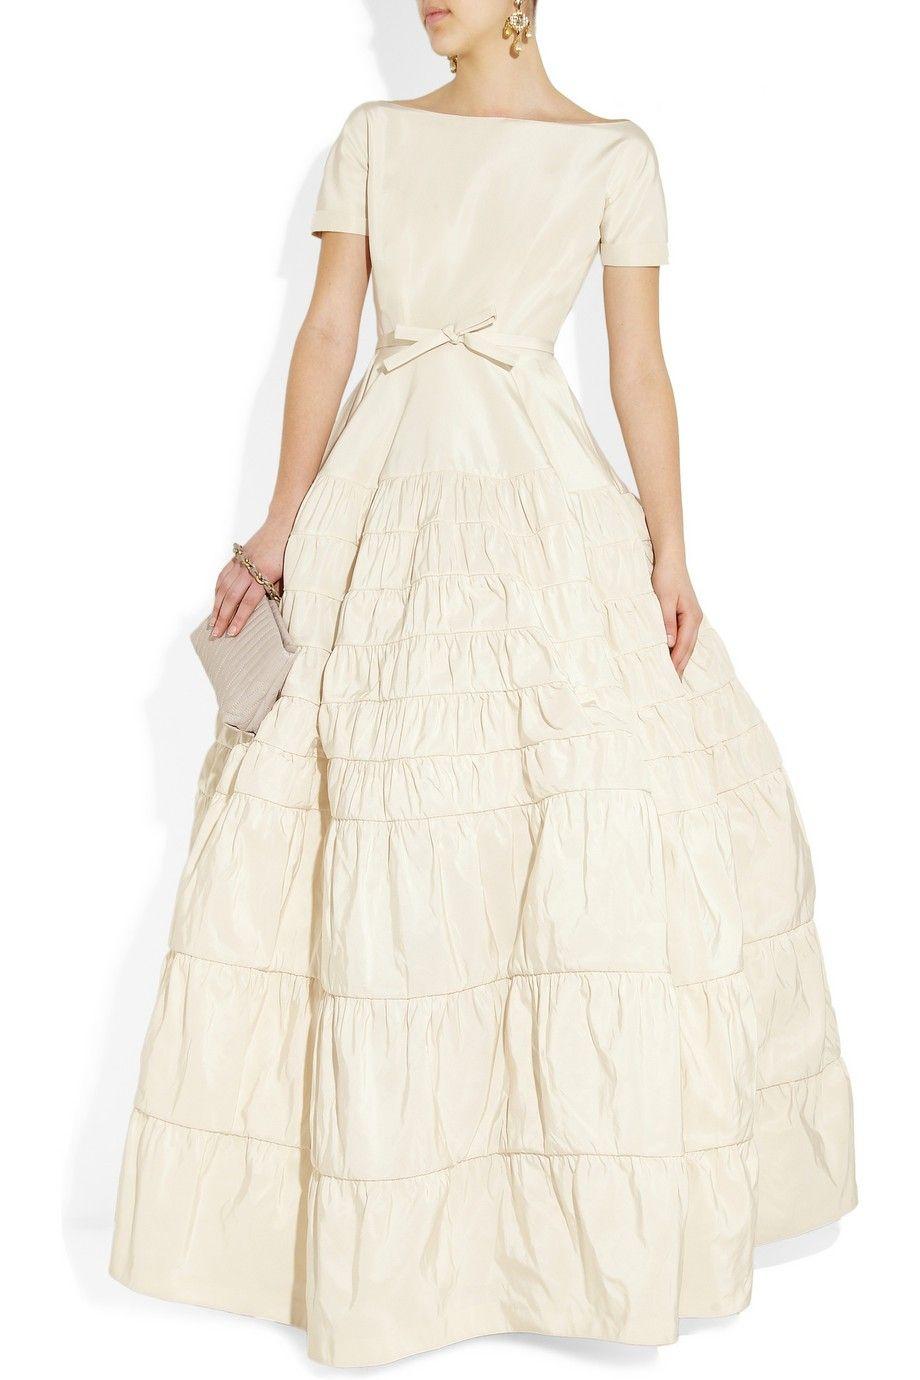 Rochas, Taffeta-twill gown, Size 6 Wedding Dress   Gowns, Wedding ...